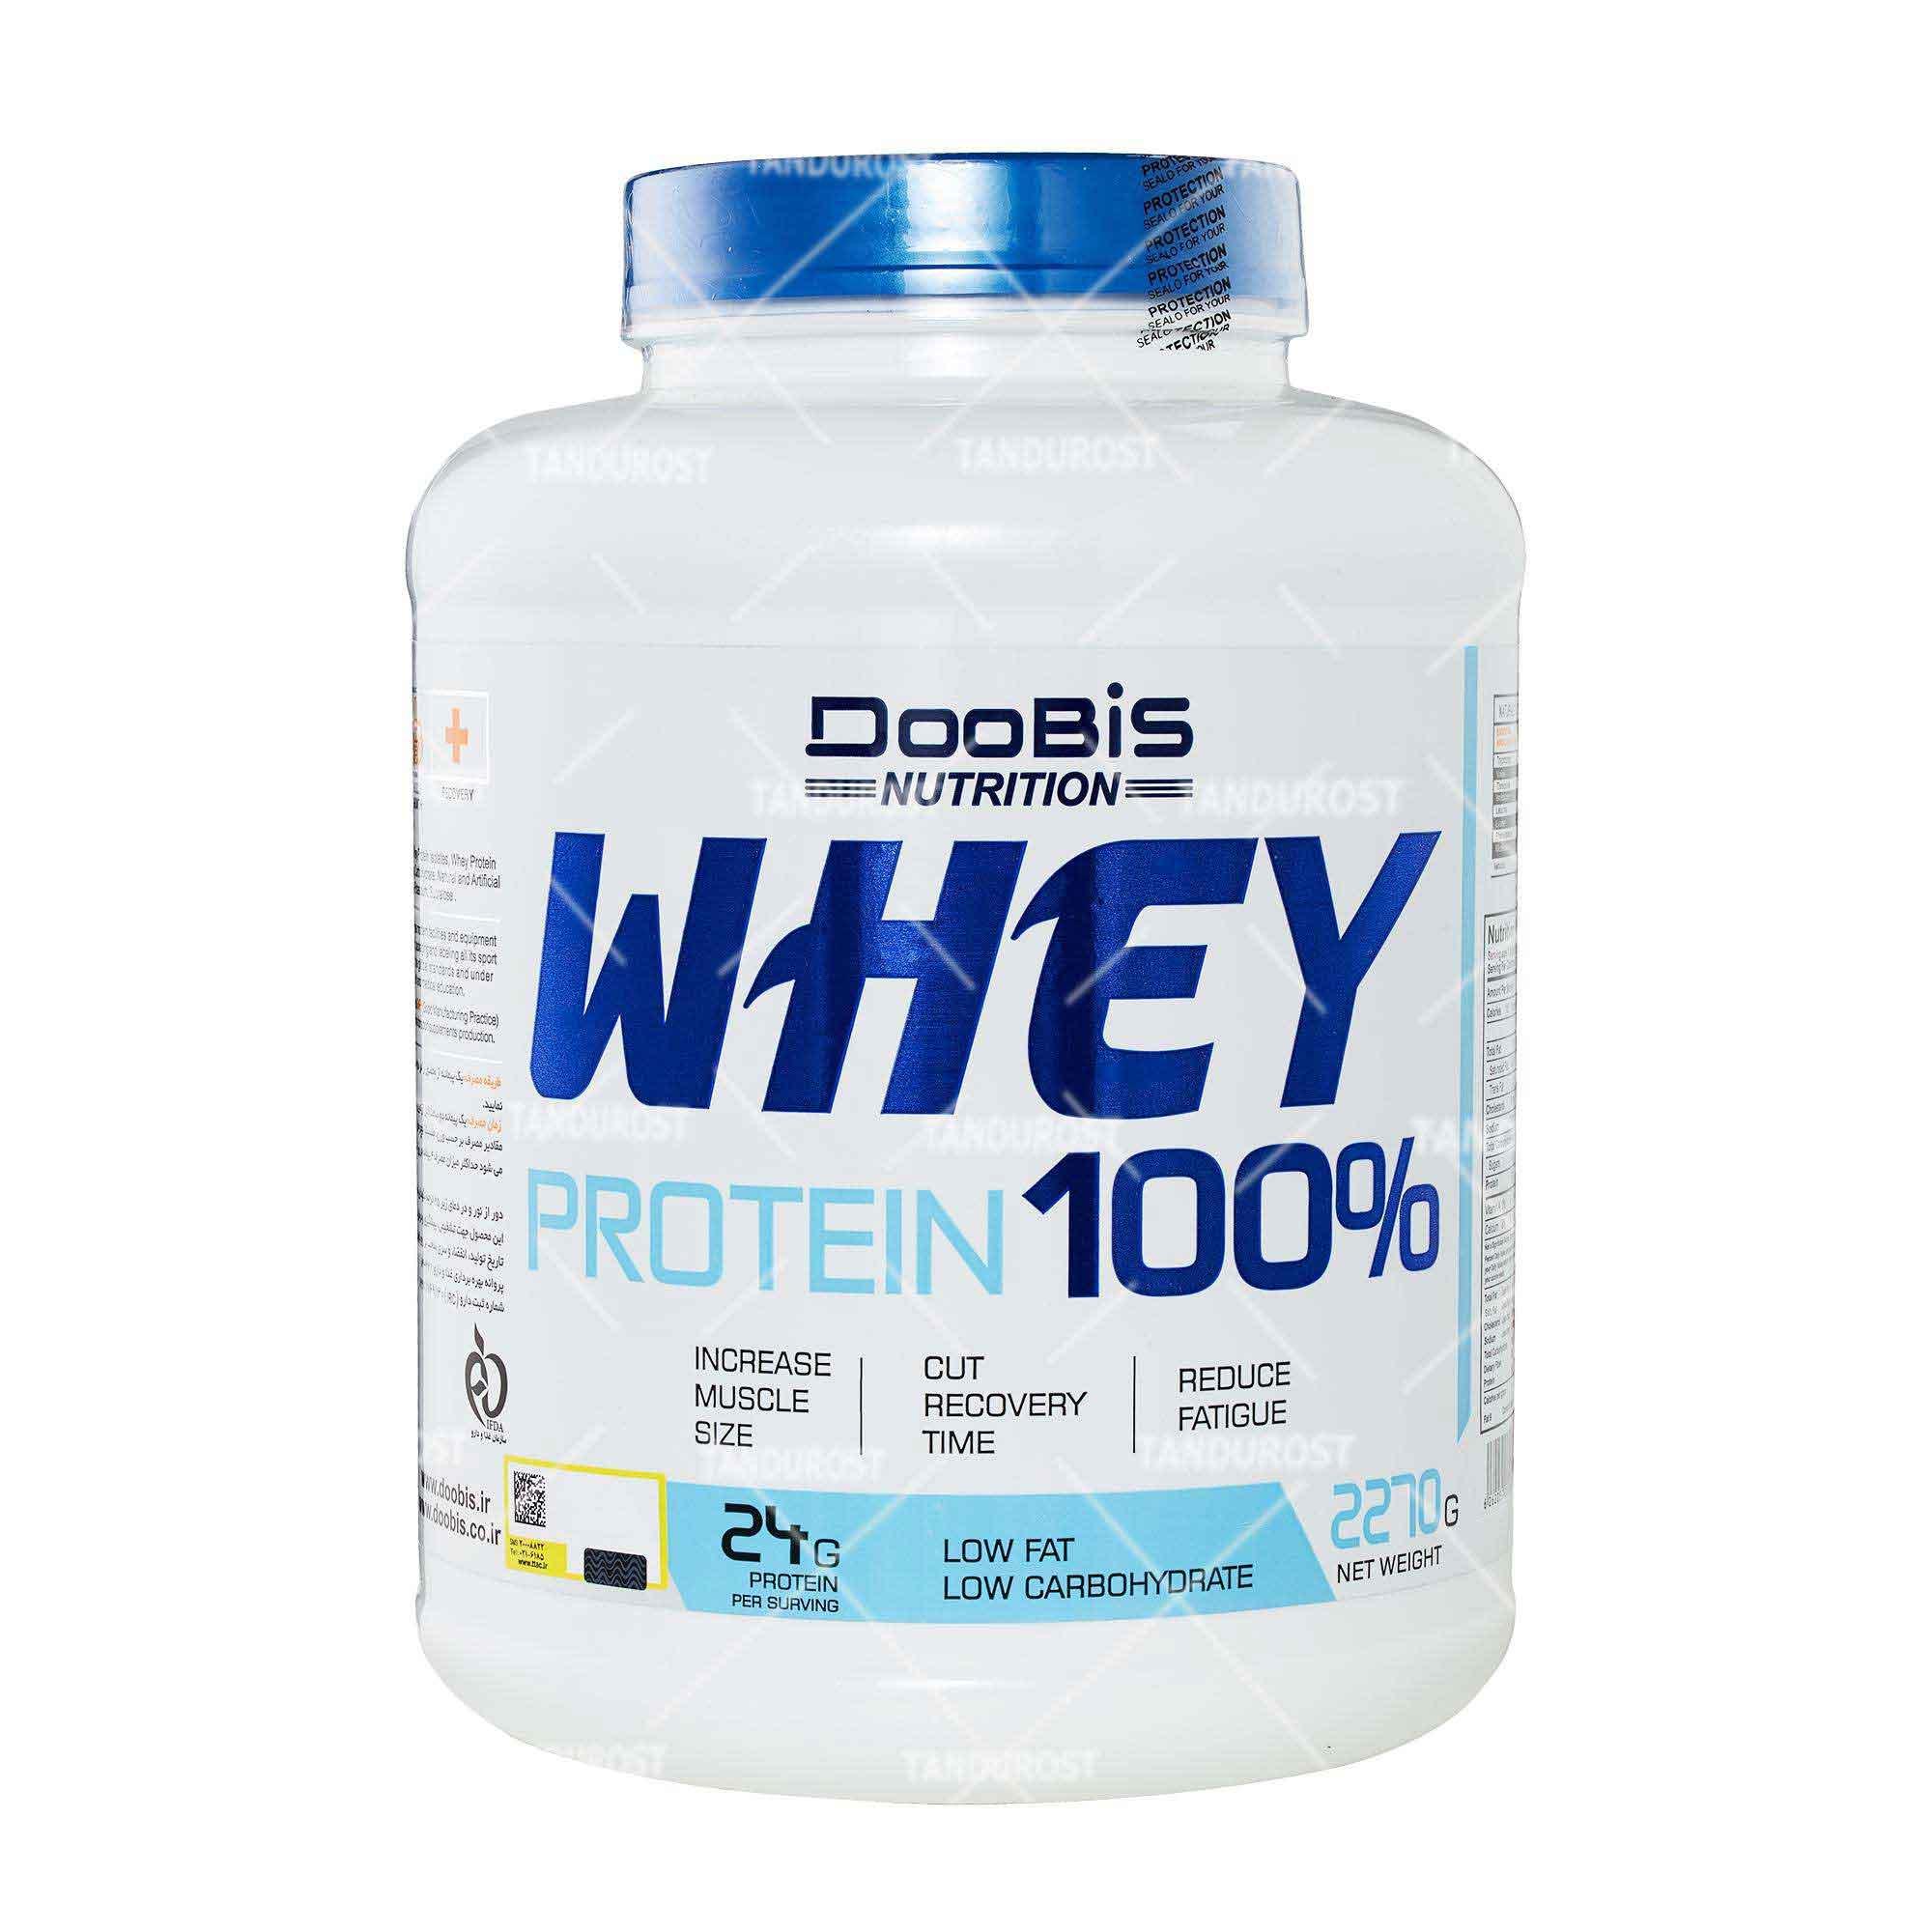 پروتئین وی دوبیس